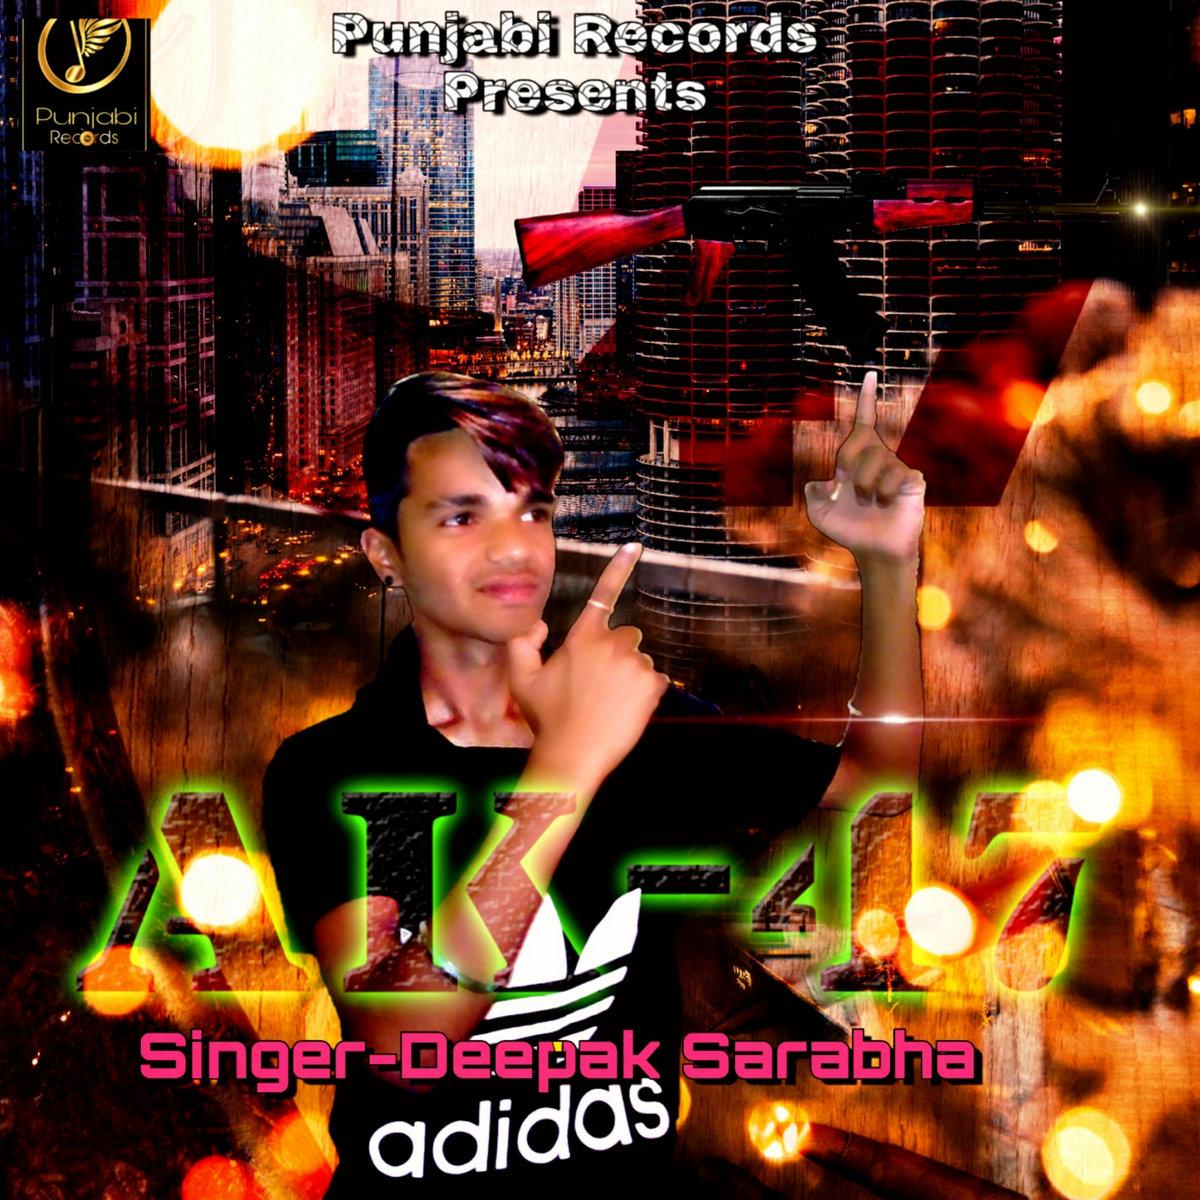 AK 47 : Deepak Sarabha | 2019 New Punjabi Song | | Deepak